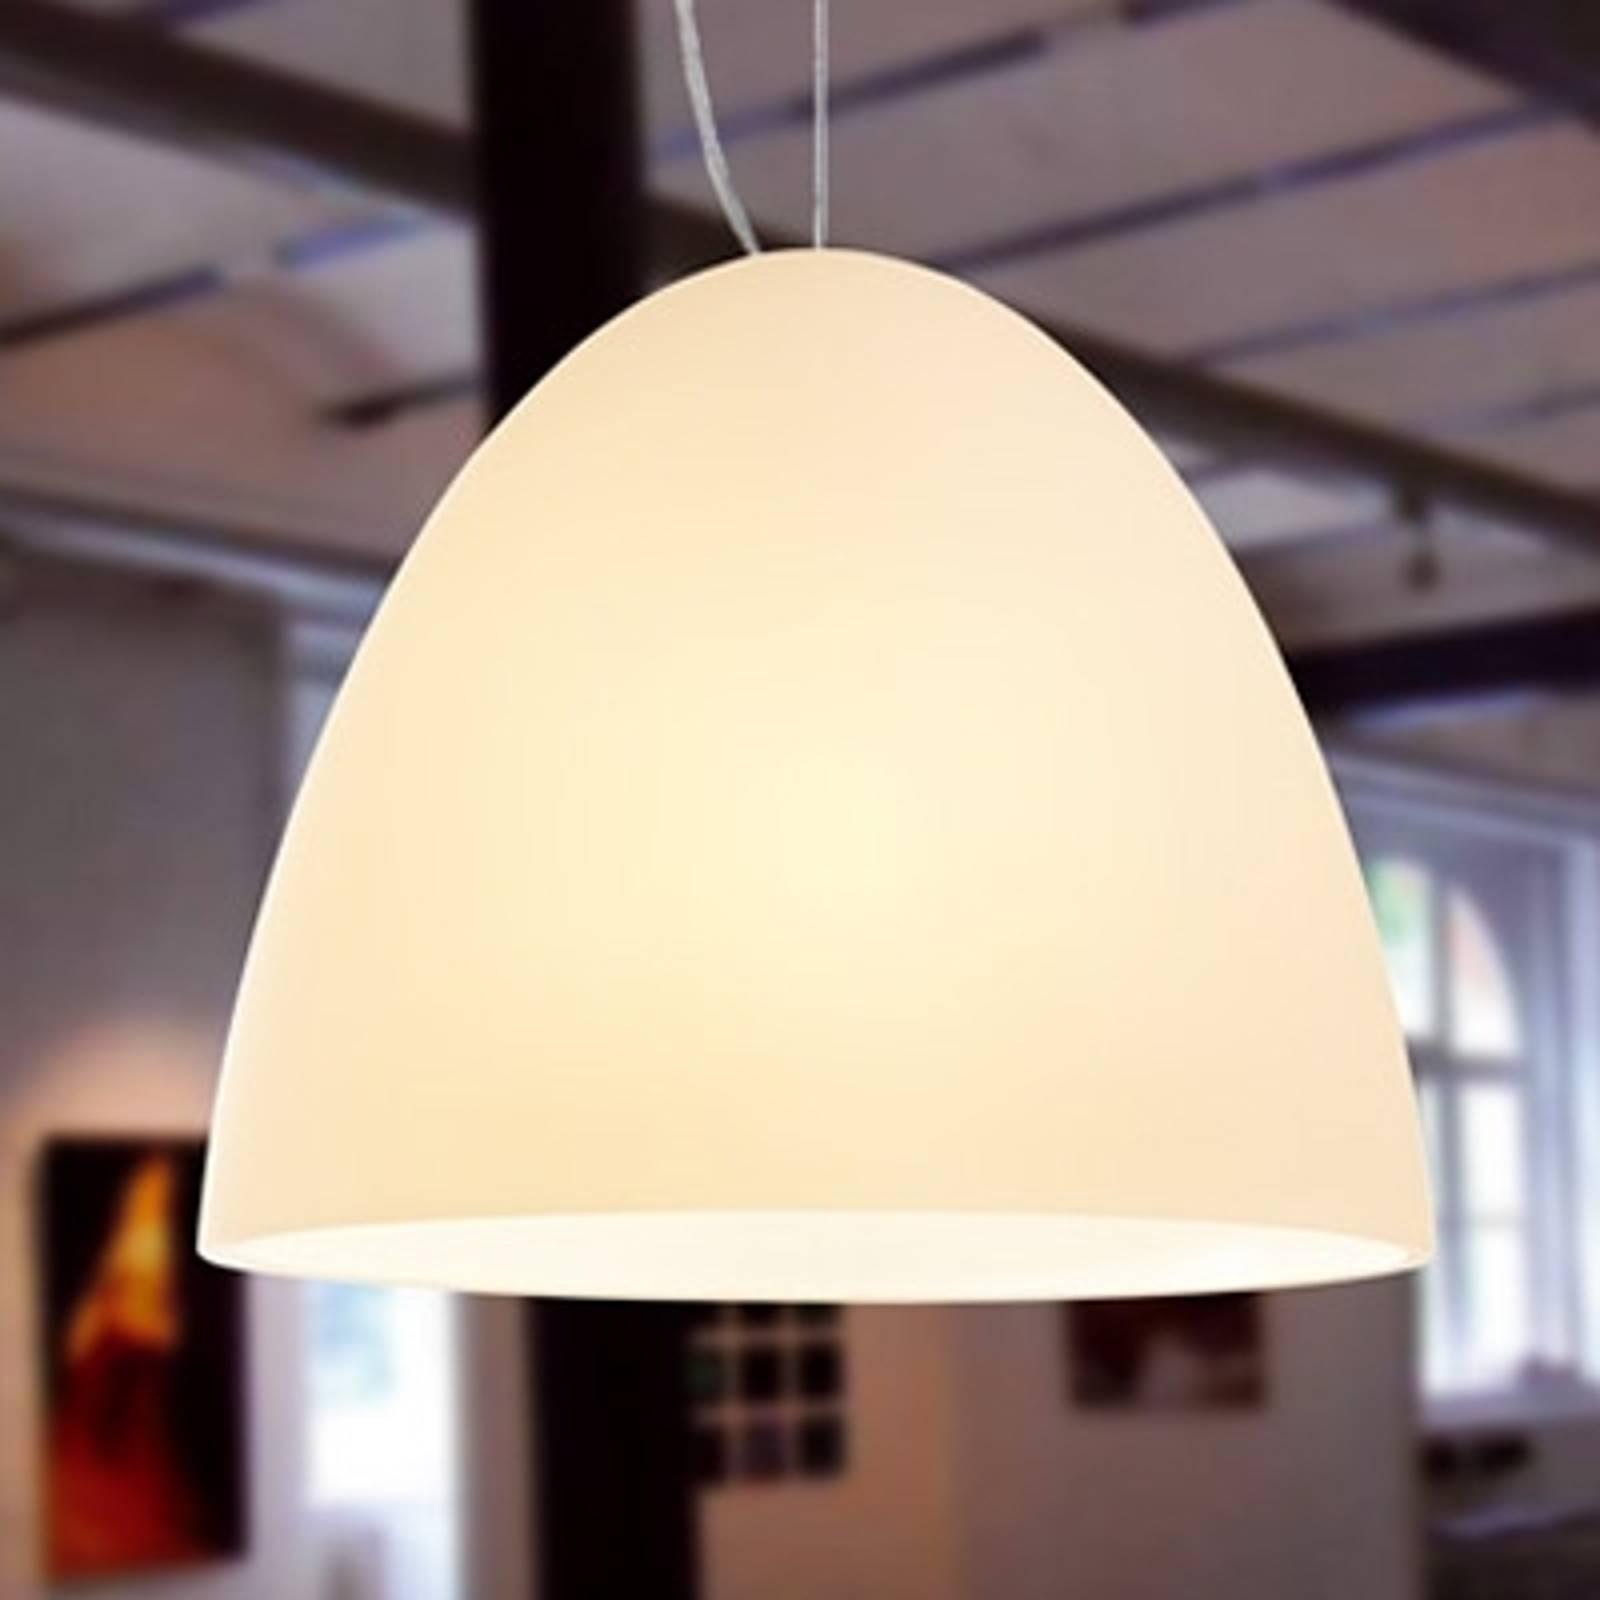 BELL 1-punktowa lampa wisząca piaskowa 30 cm